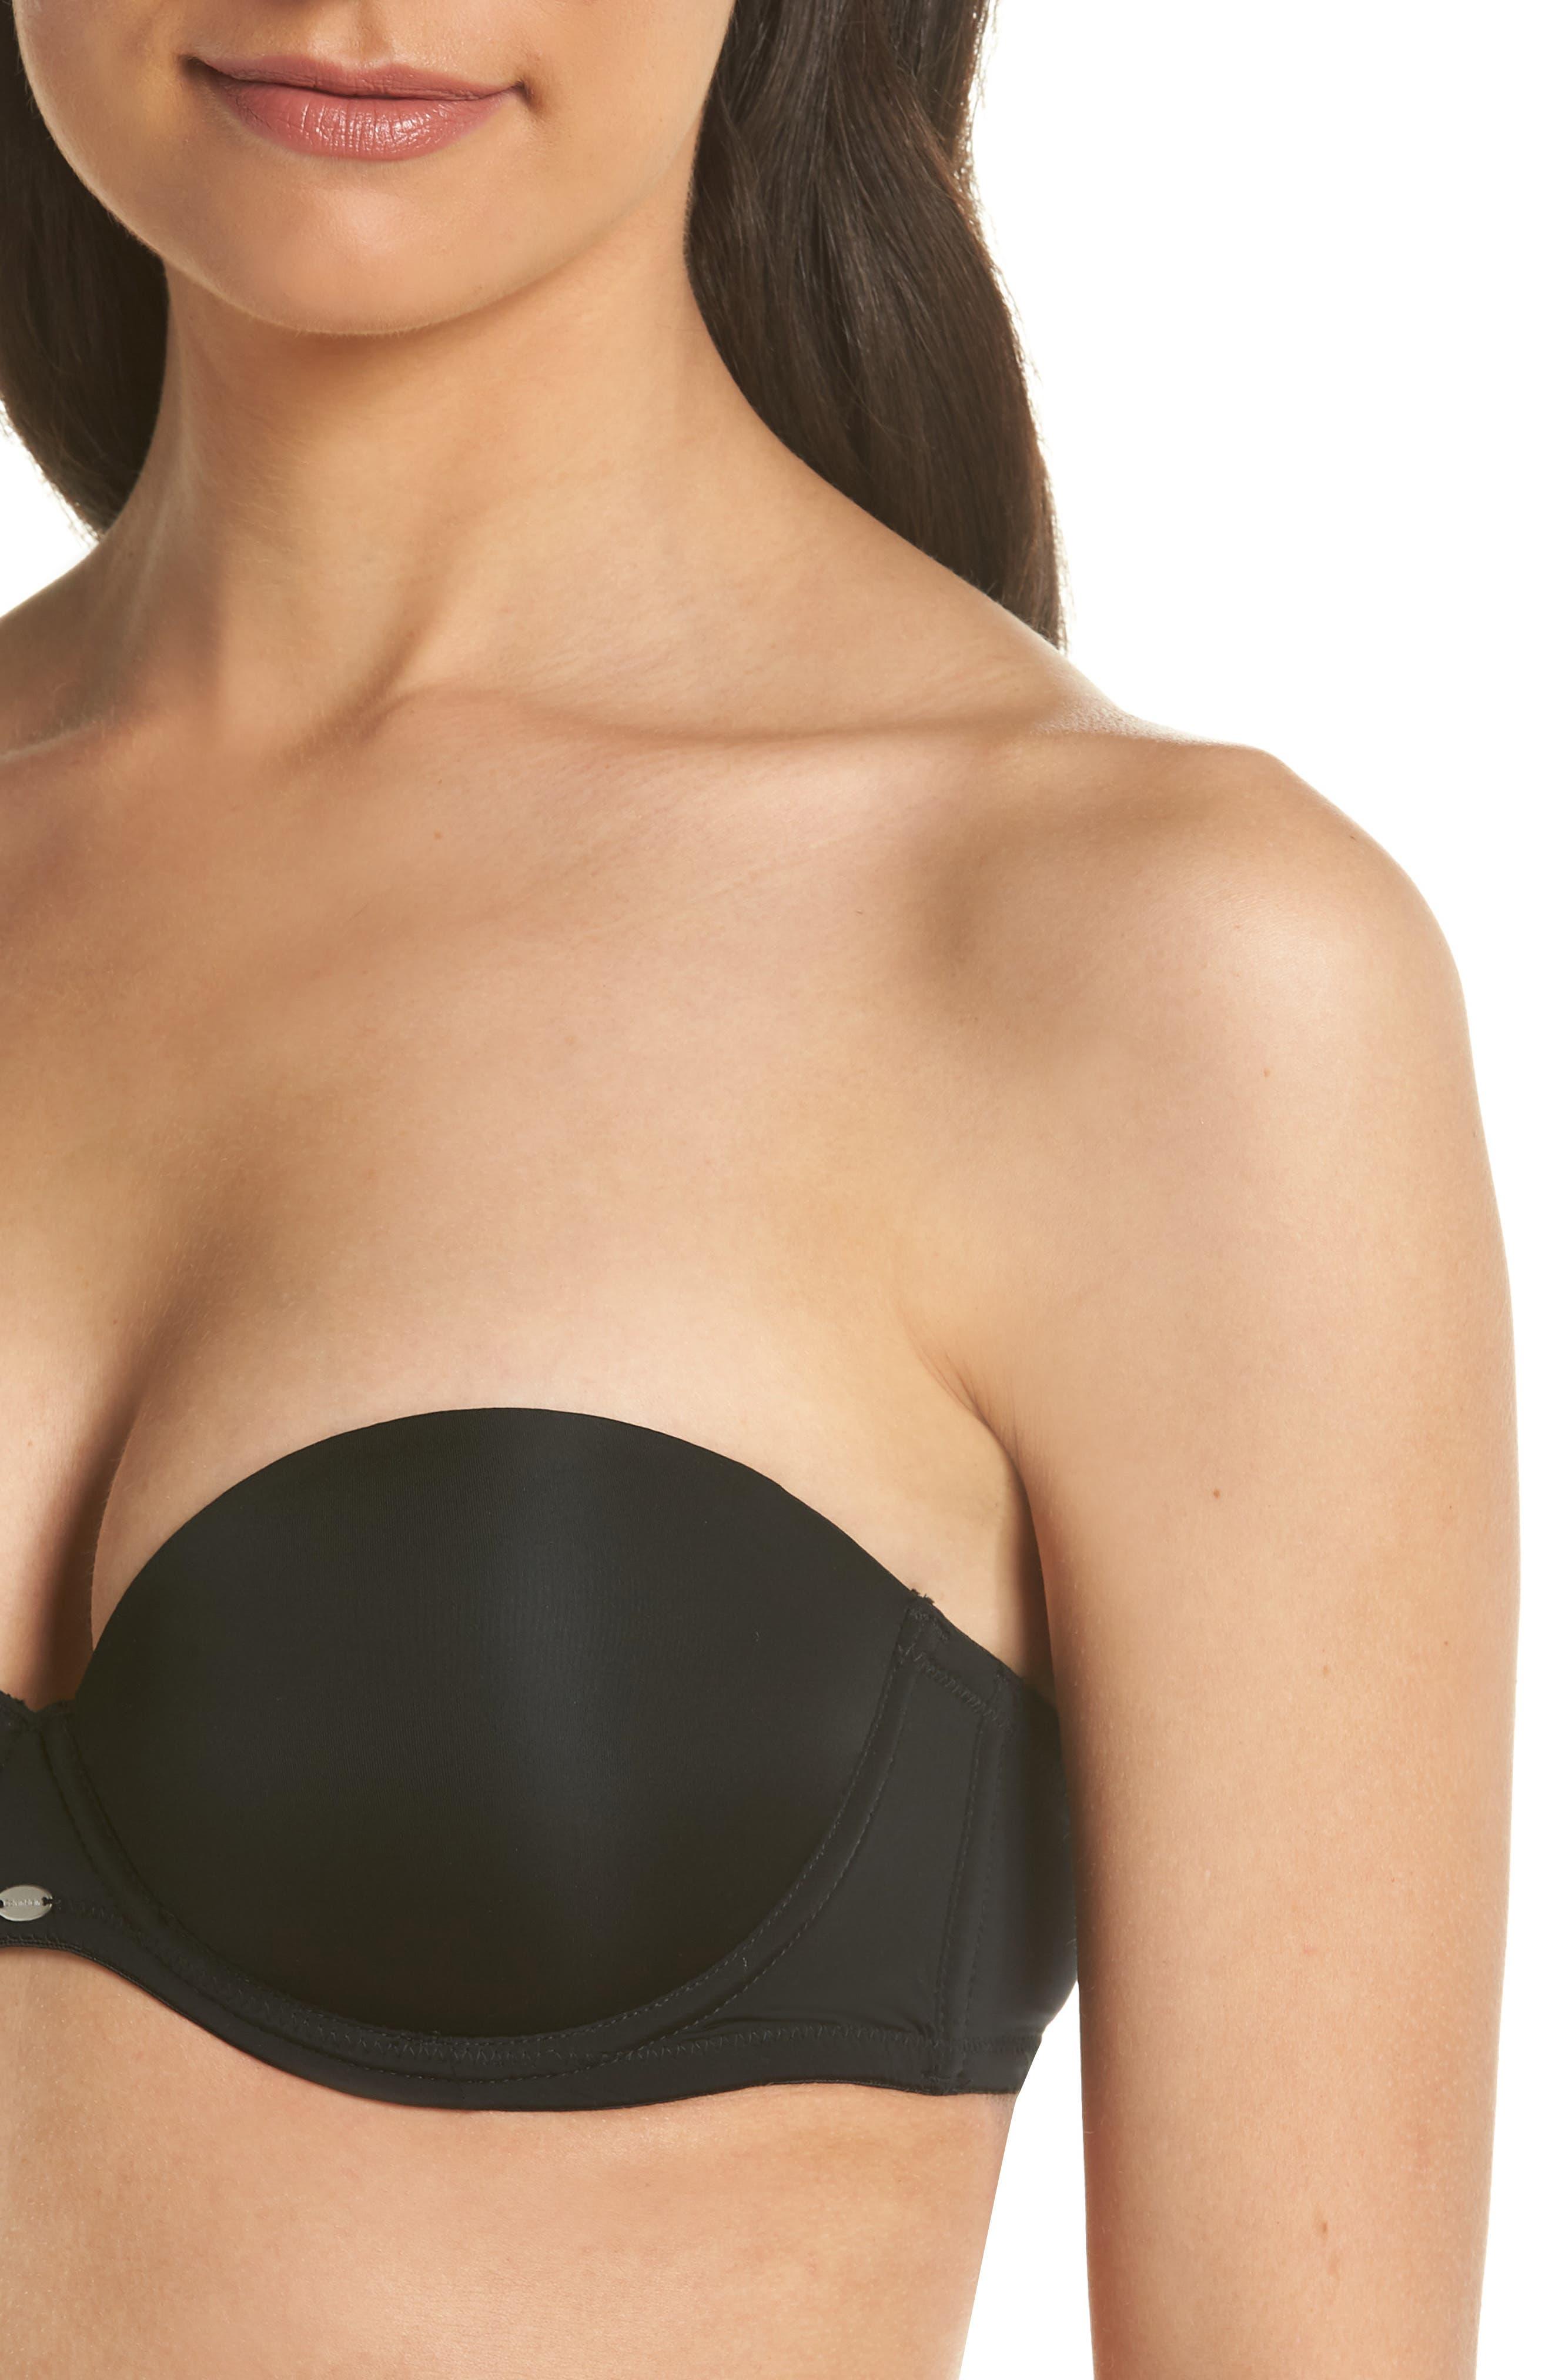 'Naked Glamour' Convertible Strapless Push-Up Bra,                             Alternate thumbnail 6, color,                             Black